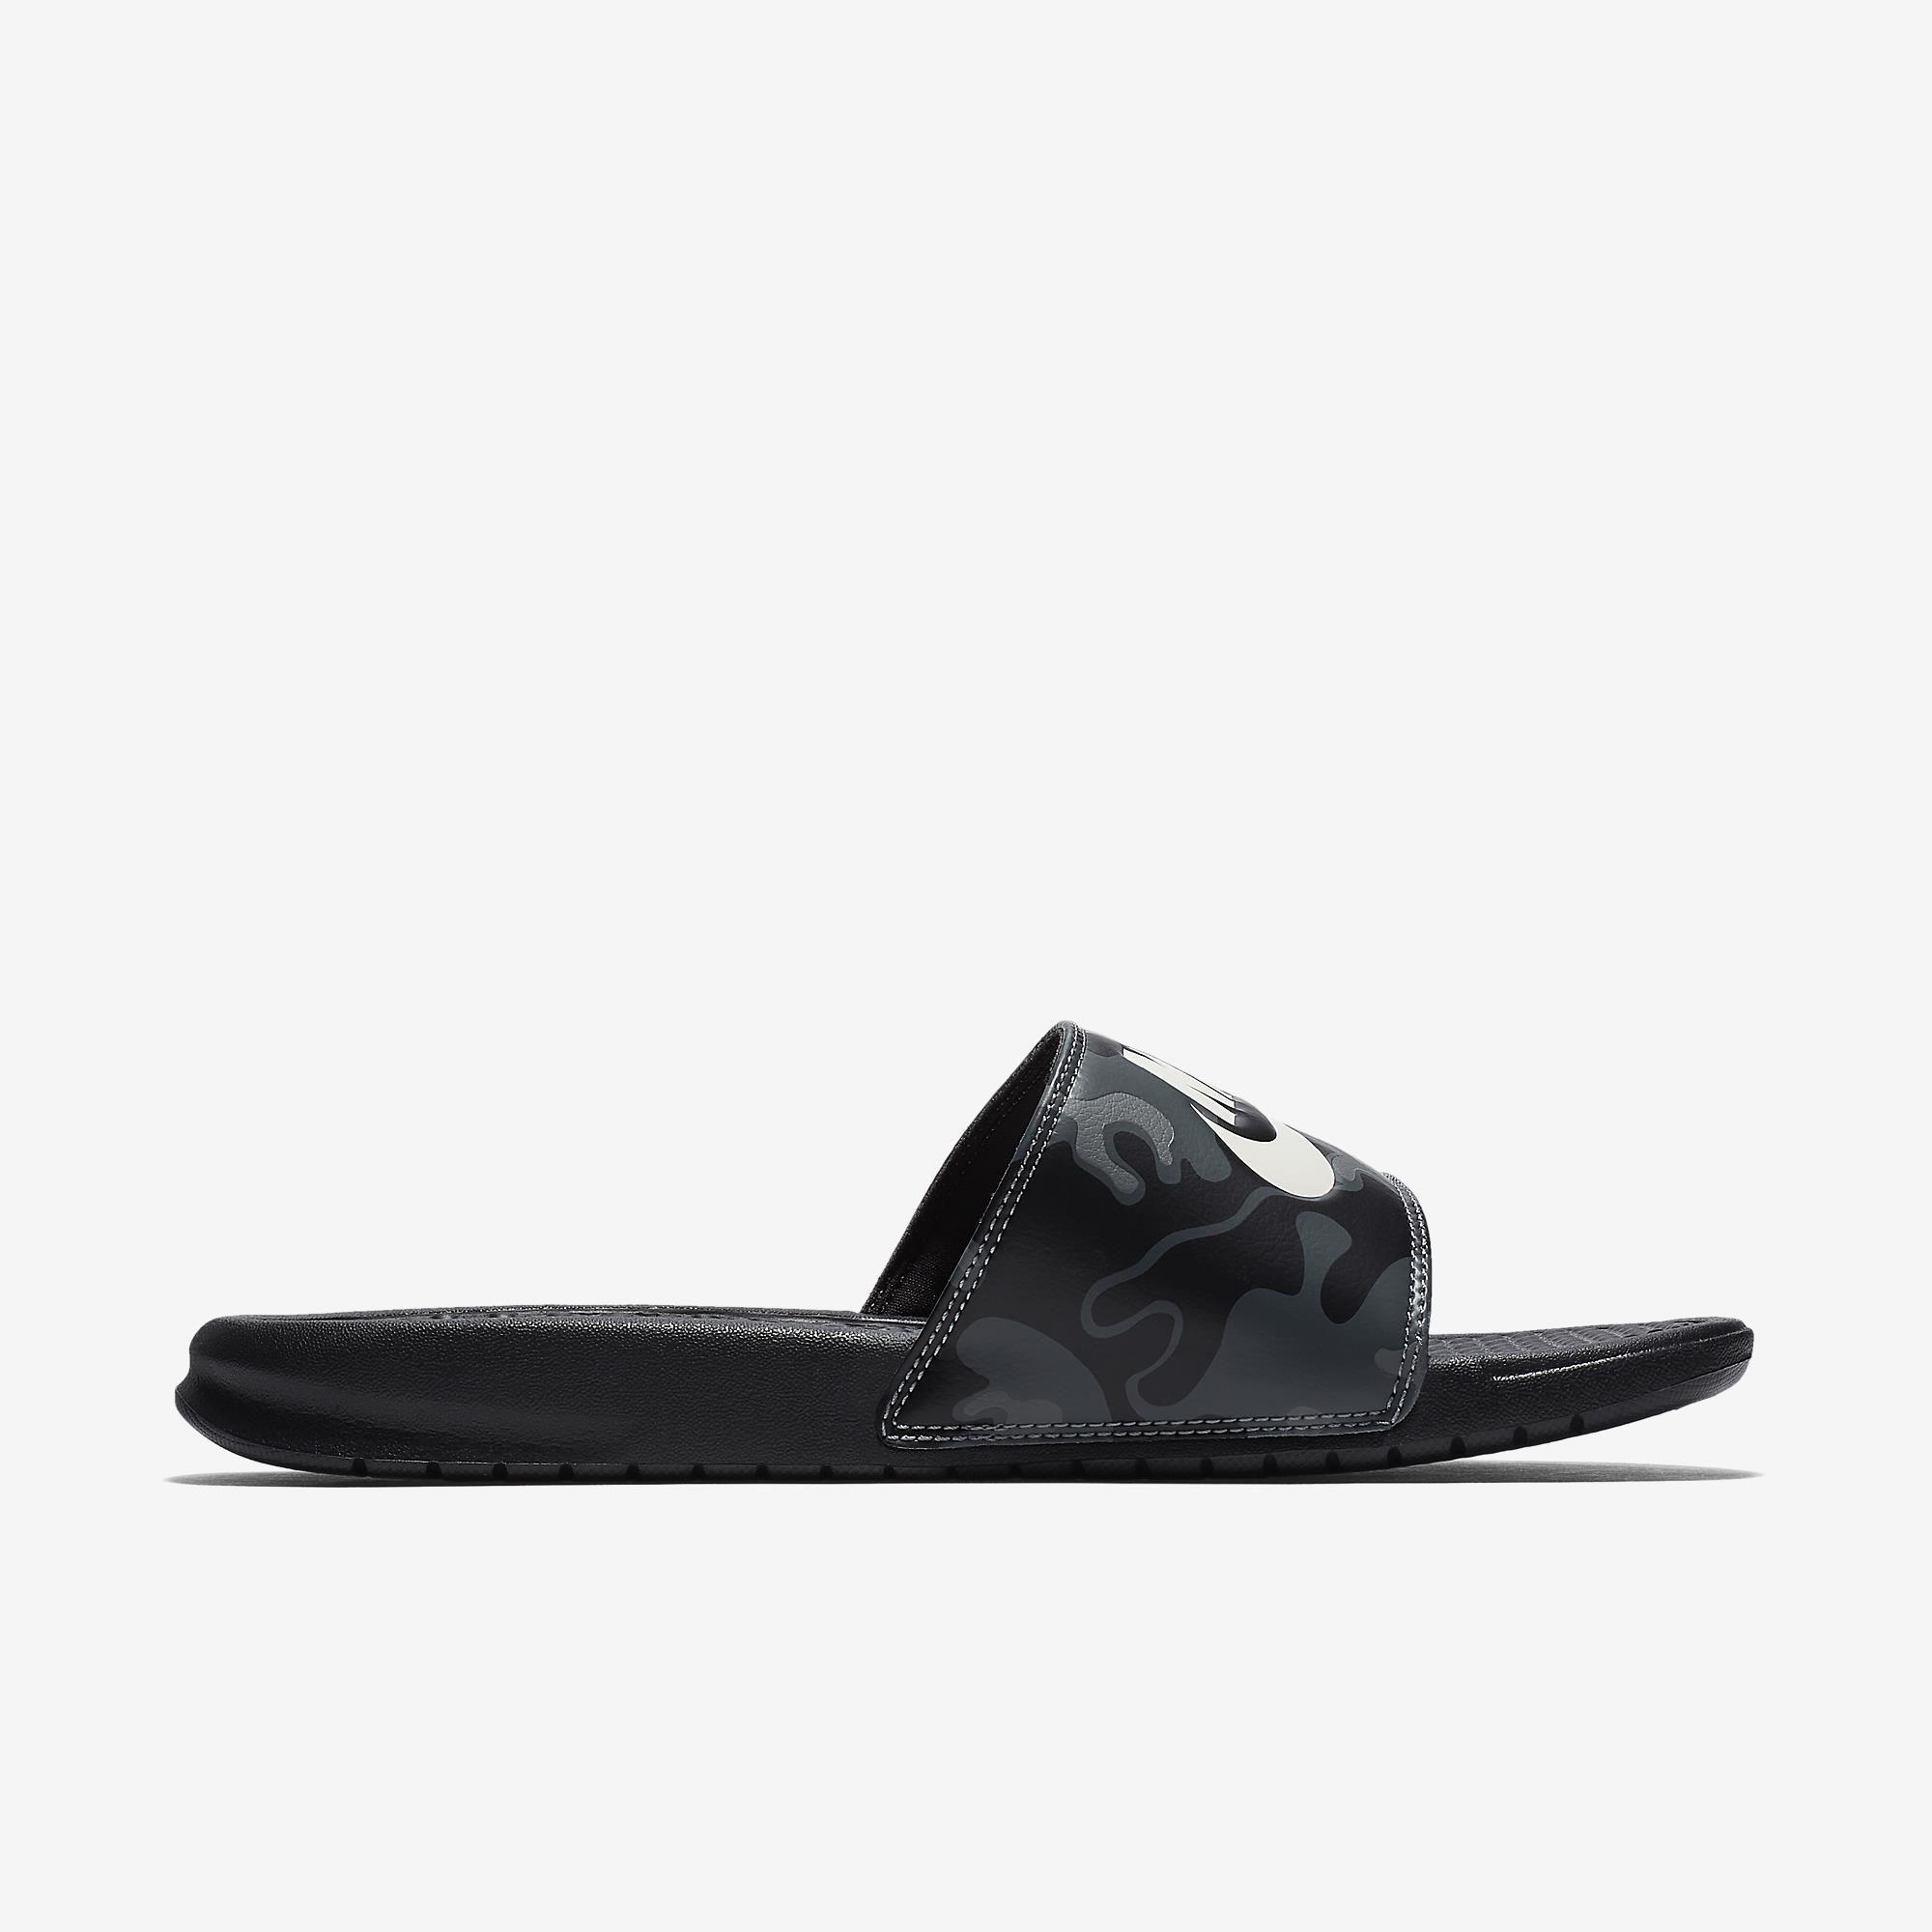 Chinelo Nike Benassi Benassi Just Do It Print